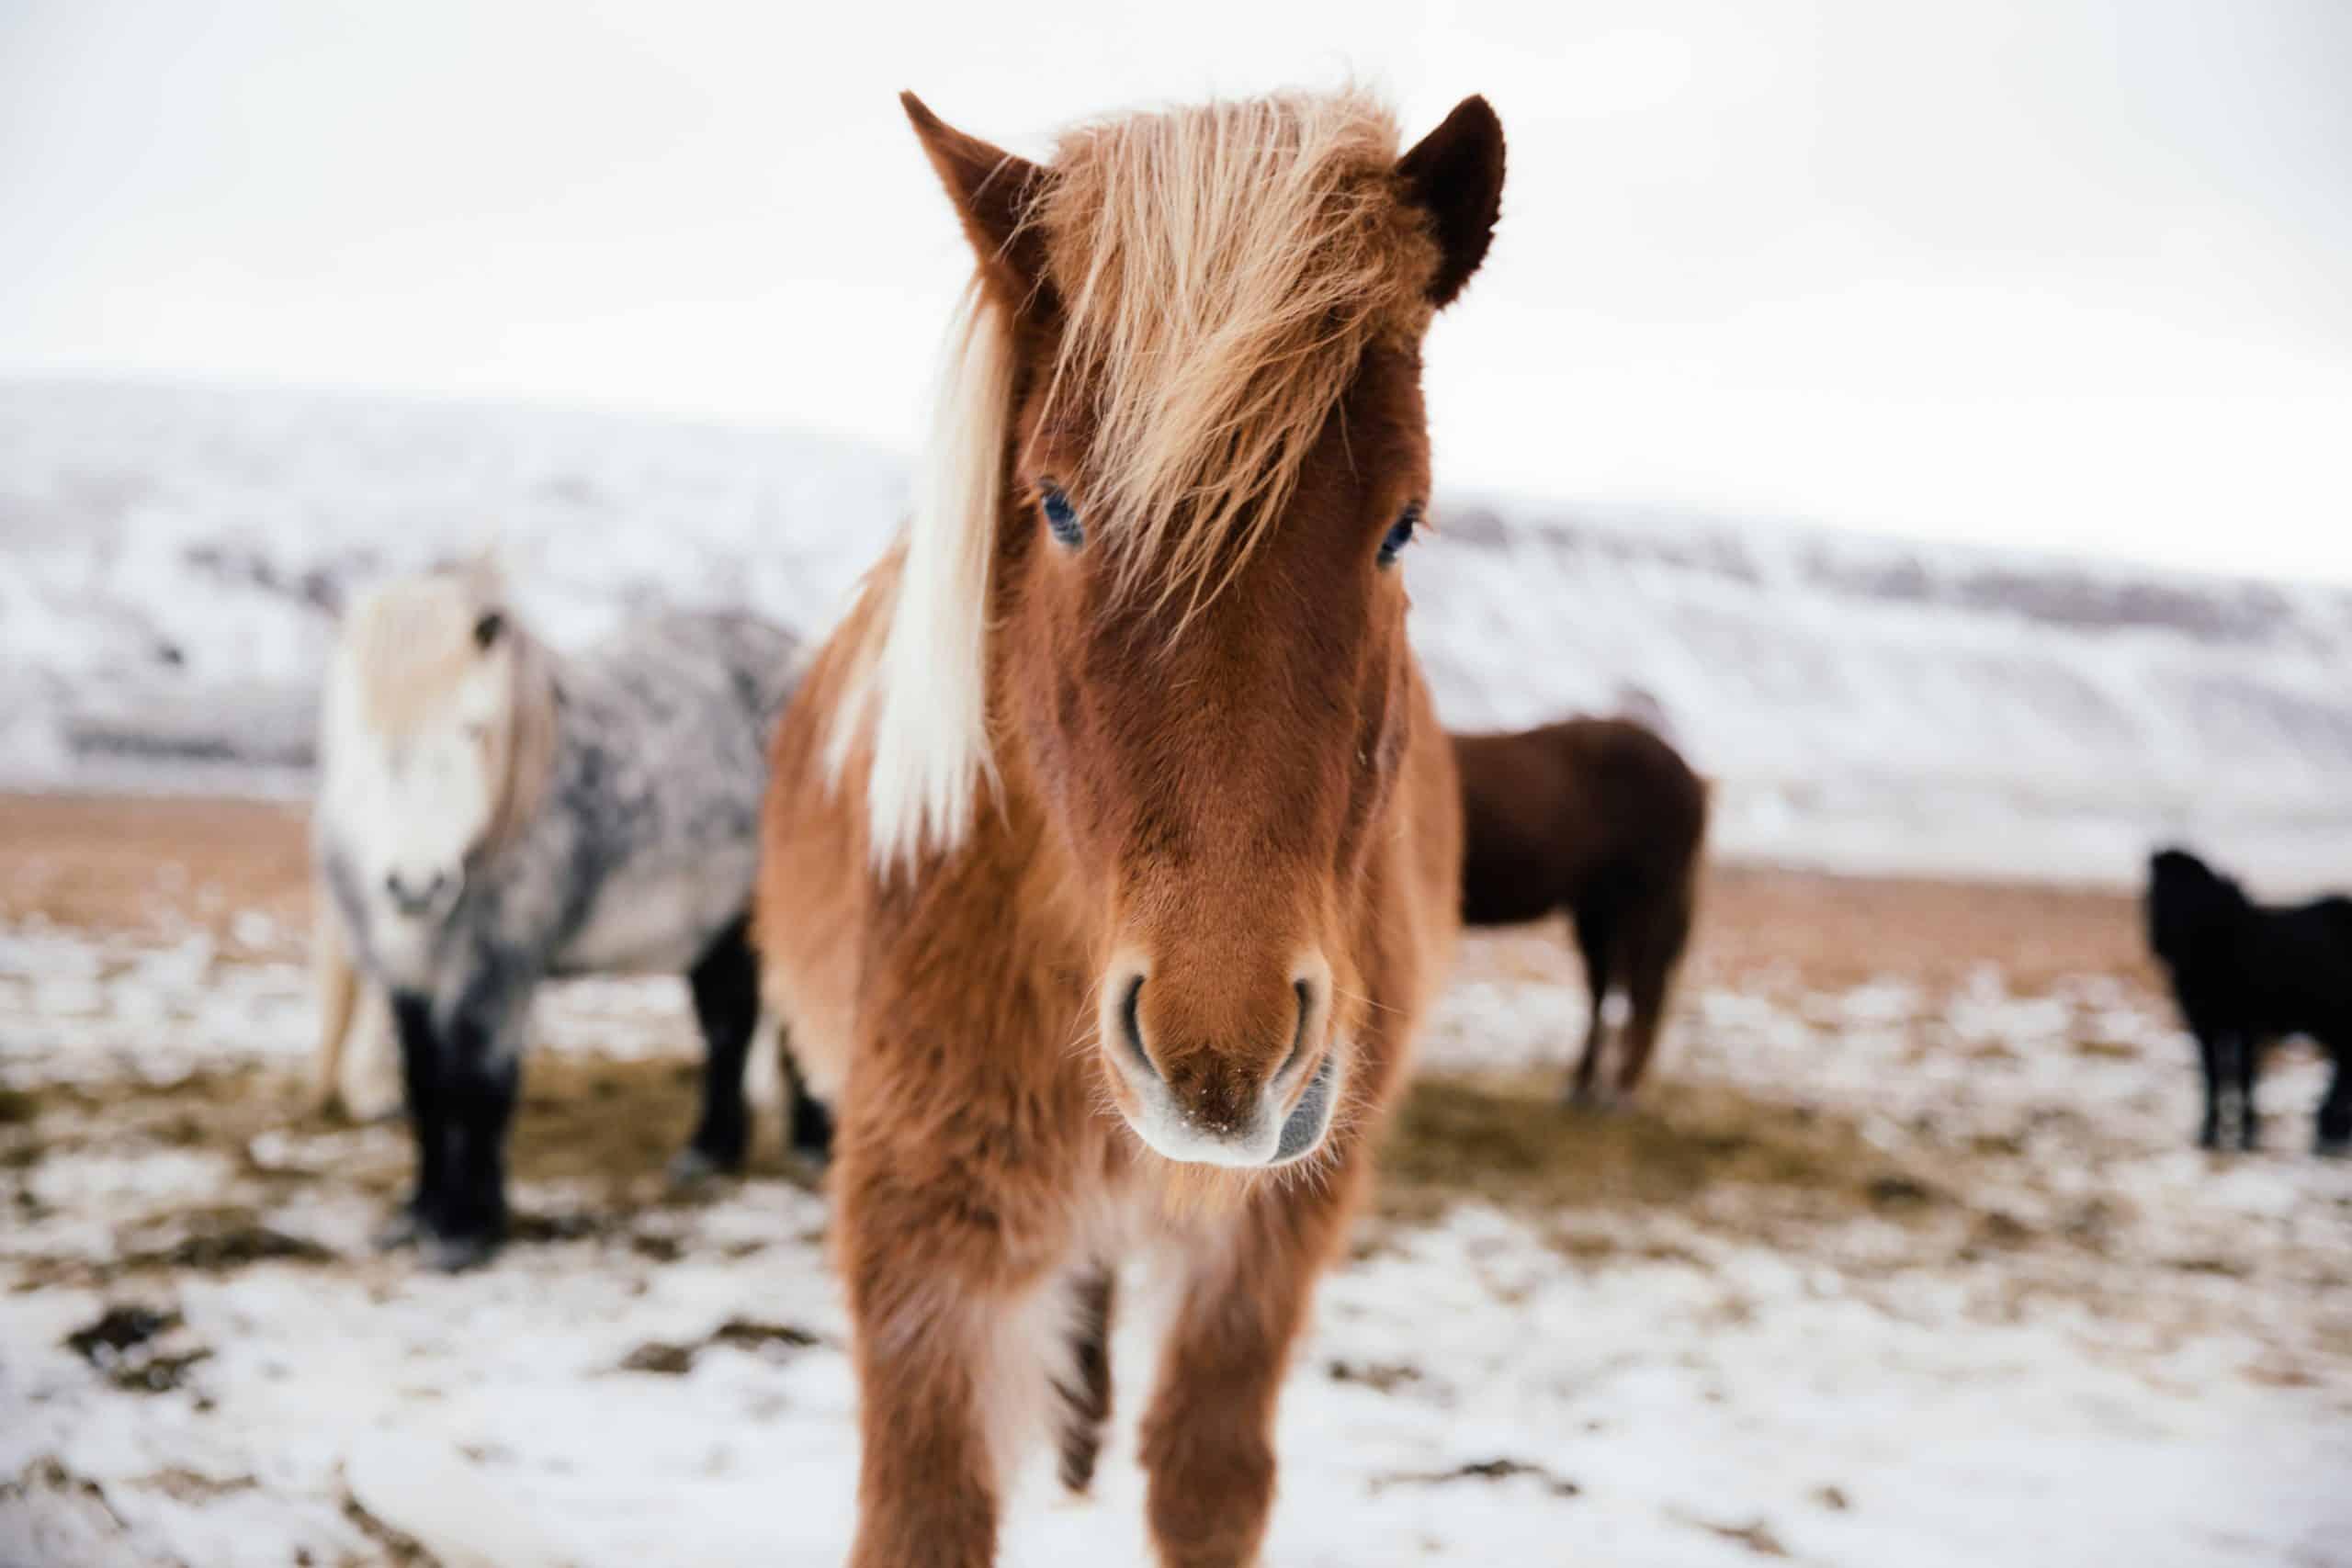 oldest horse breeds Icelandic Horse